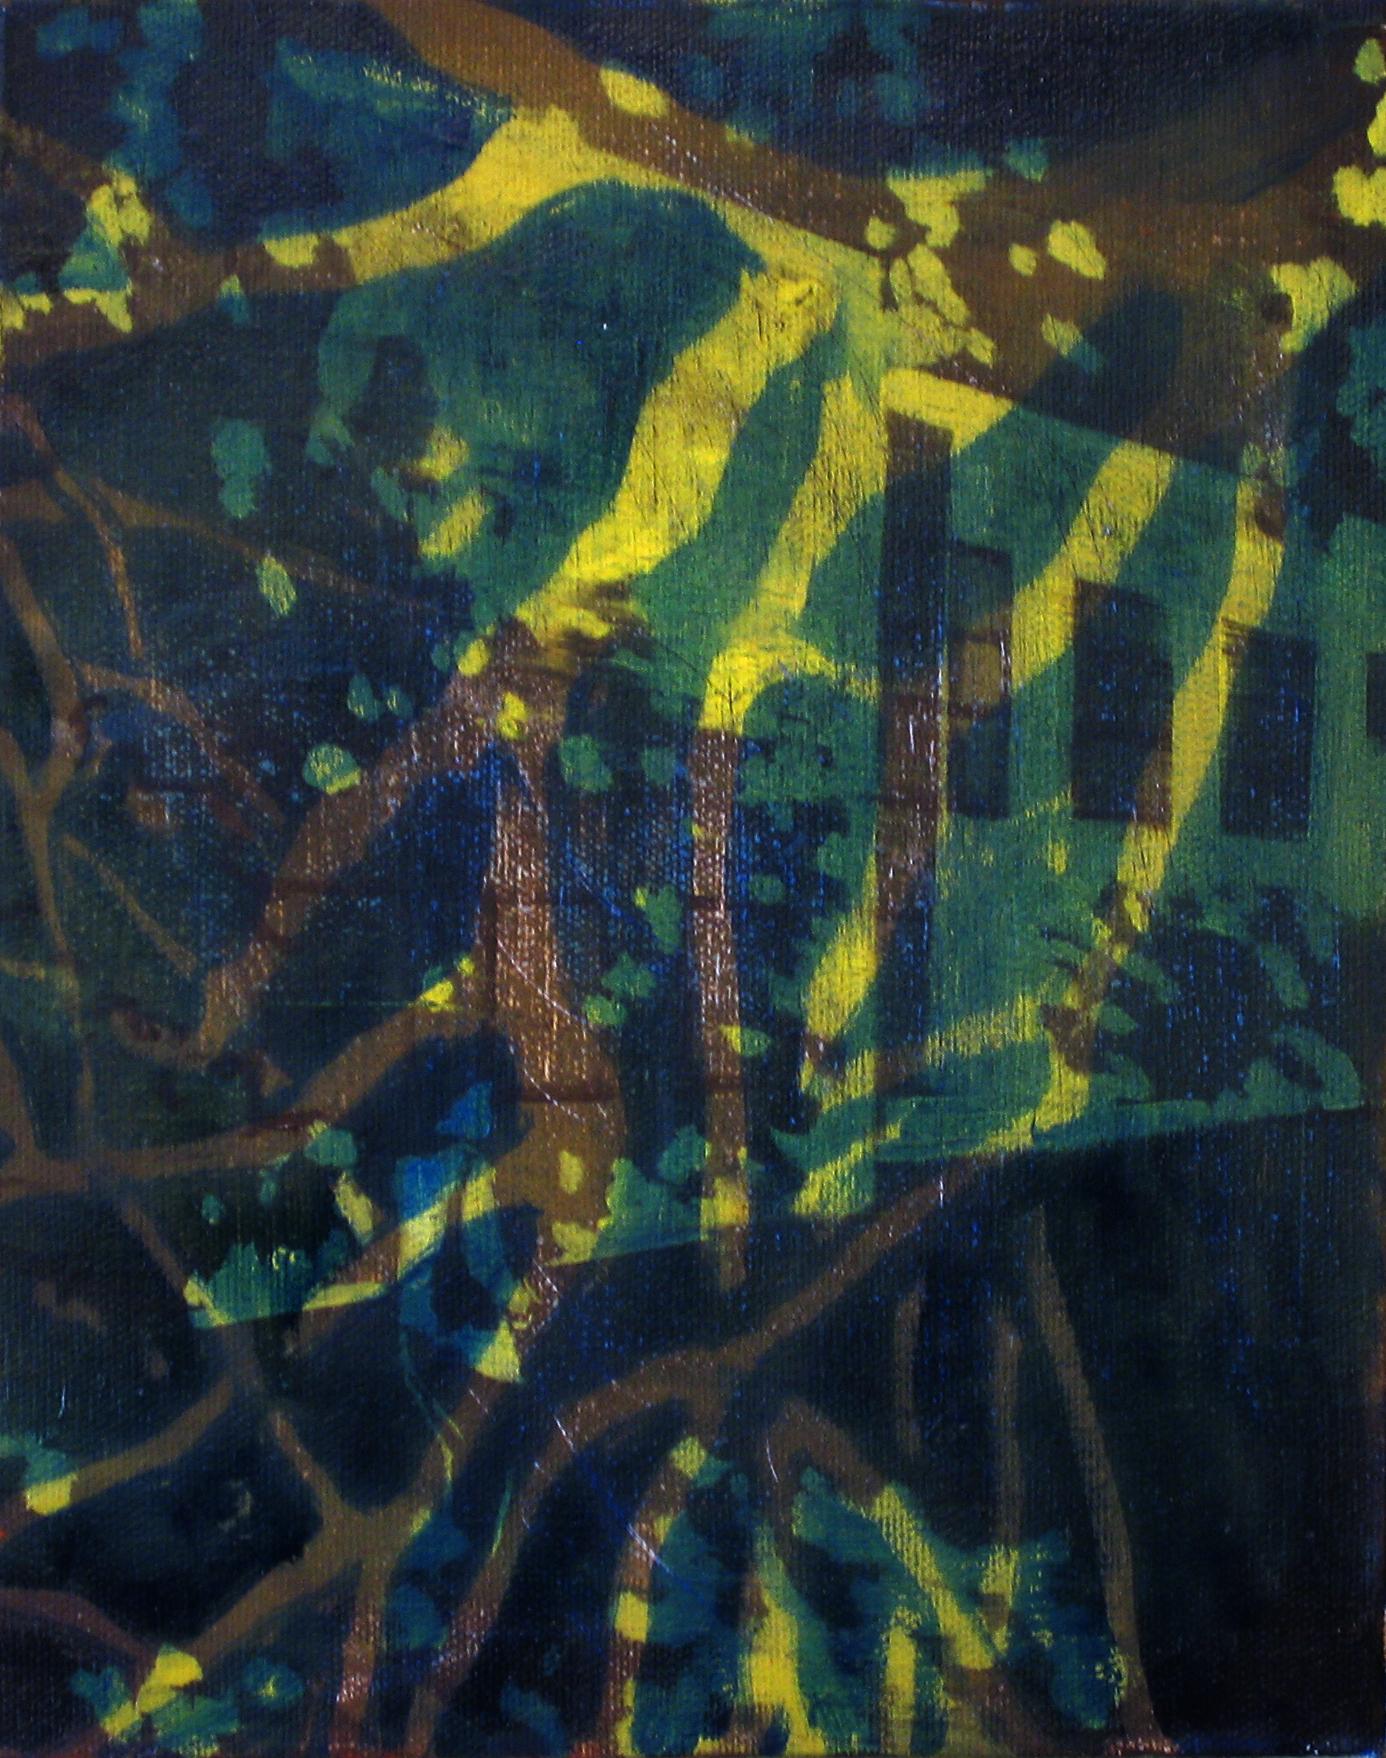 School Trees   10 x 8  Oil On Canvas  2010